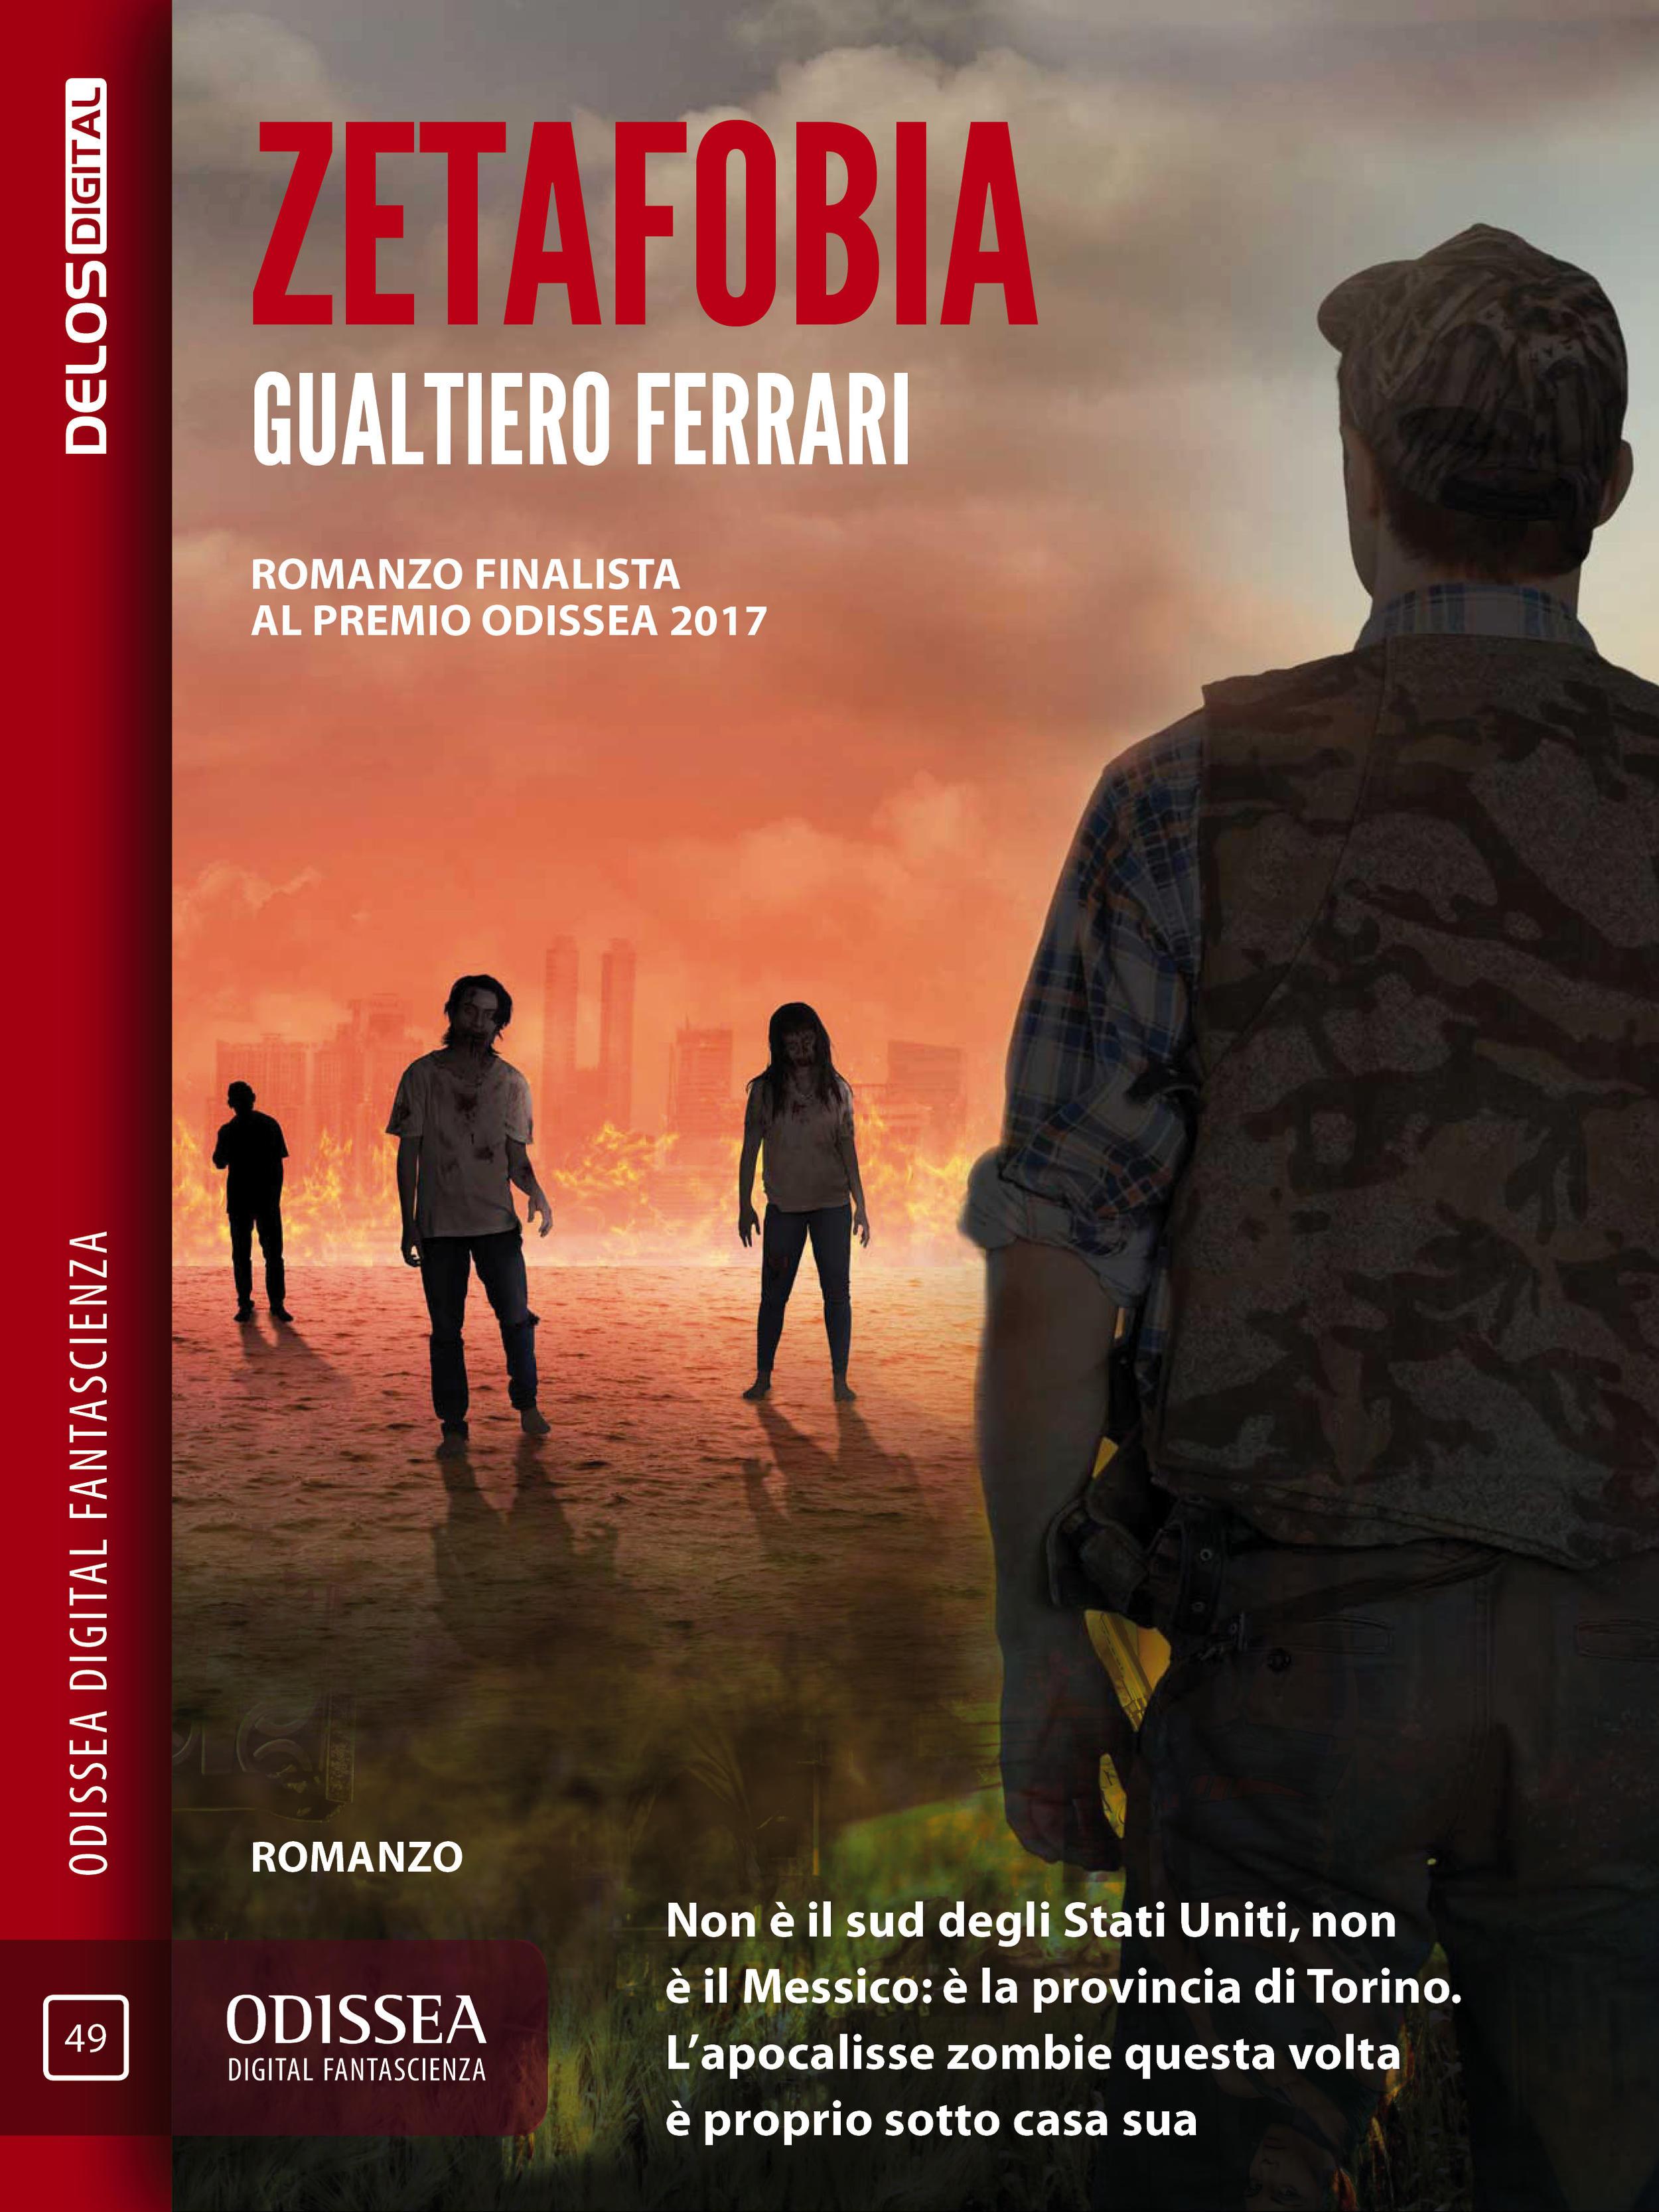 gualtiero ferrari booktrailer book trailer youtube